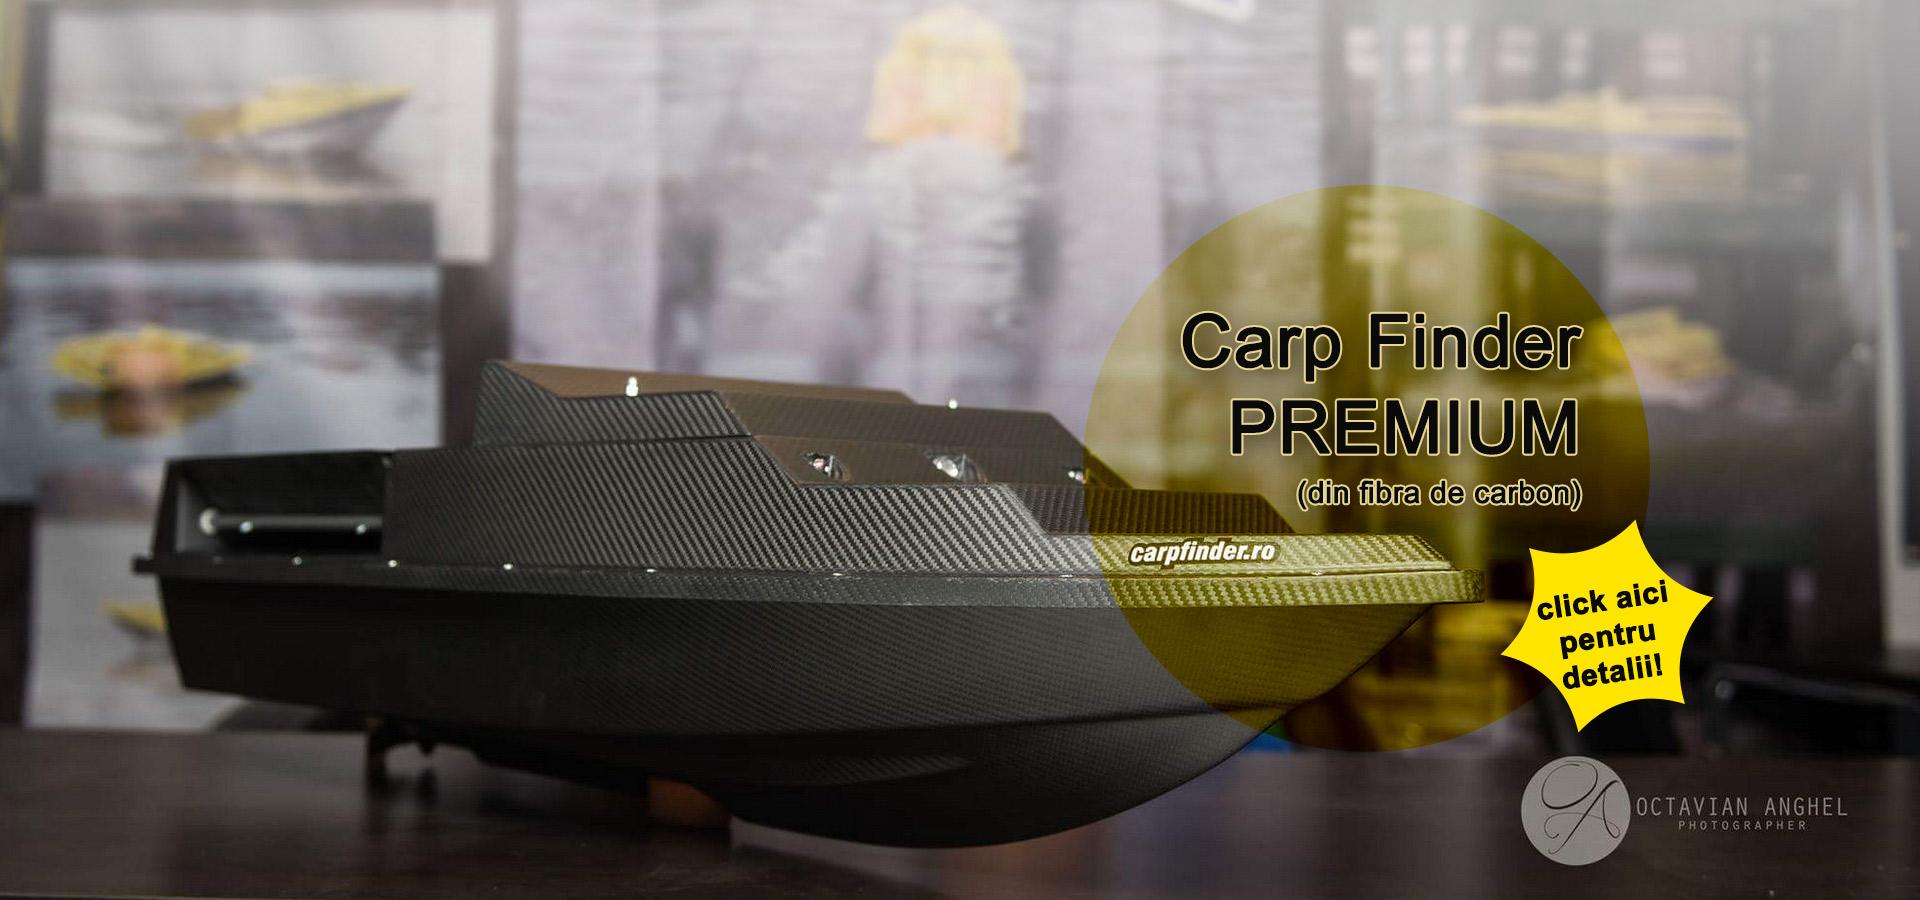 Carp Finder PREMIUM- Vaporas de nadit